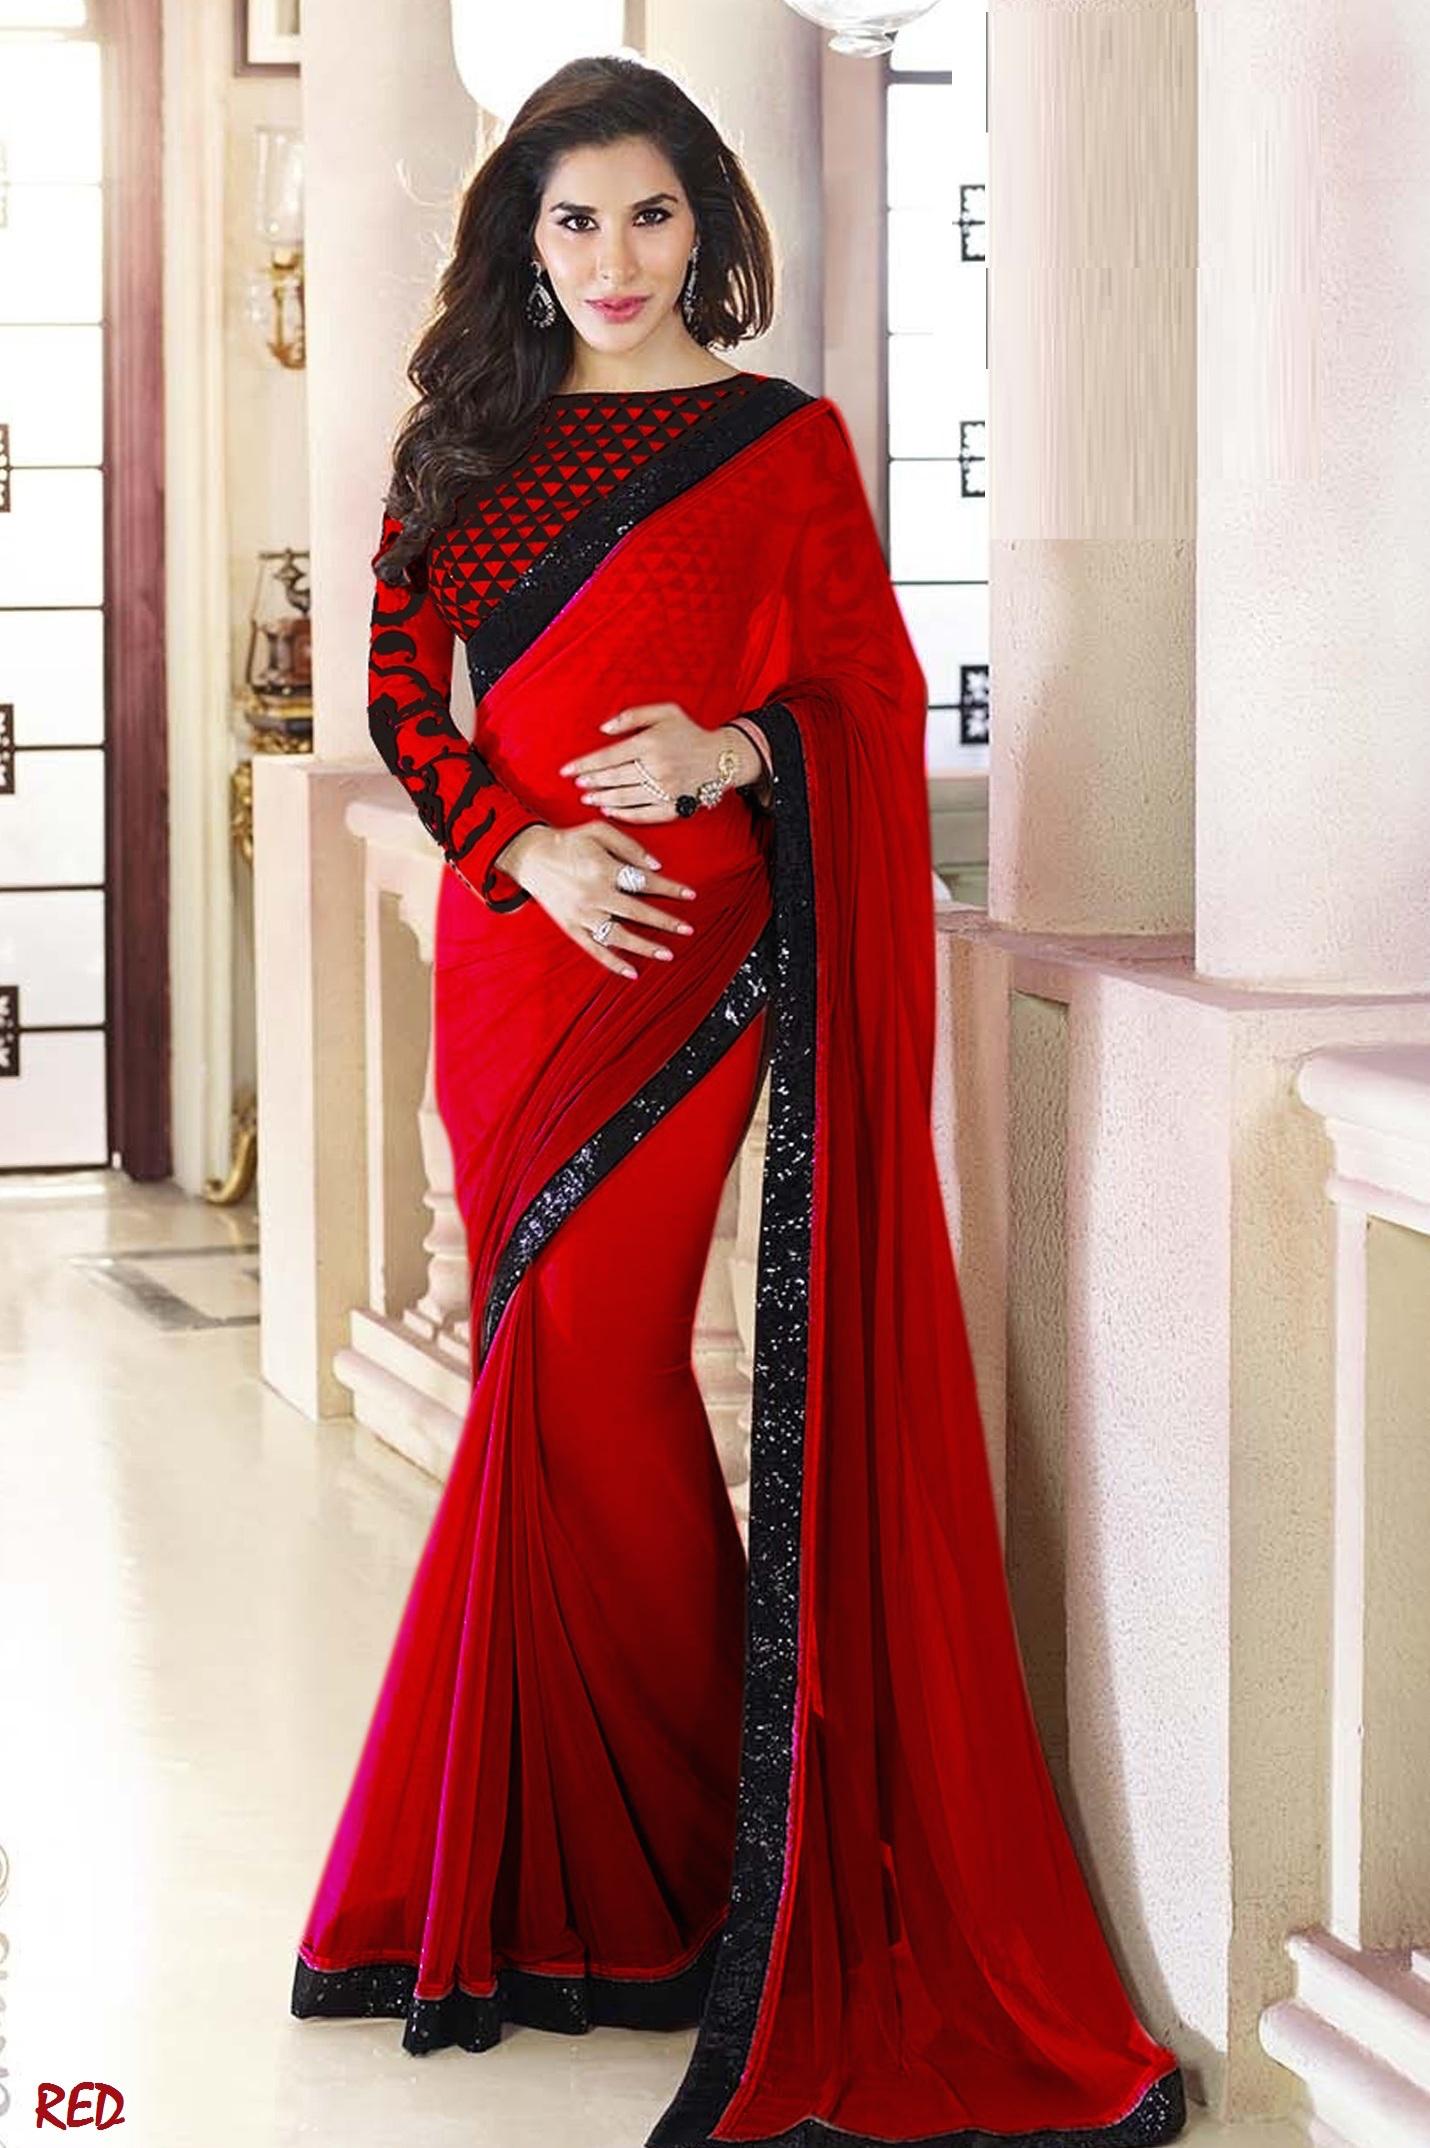 c0b61e6e68d4e5 Red Plain Georgette designer saree with blouse - Manjula Feb - 382077